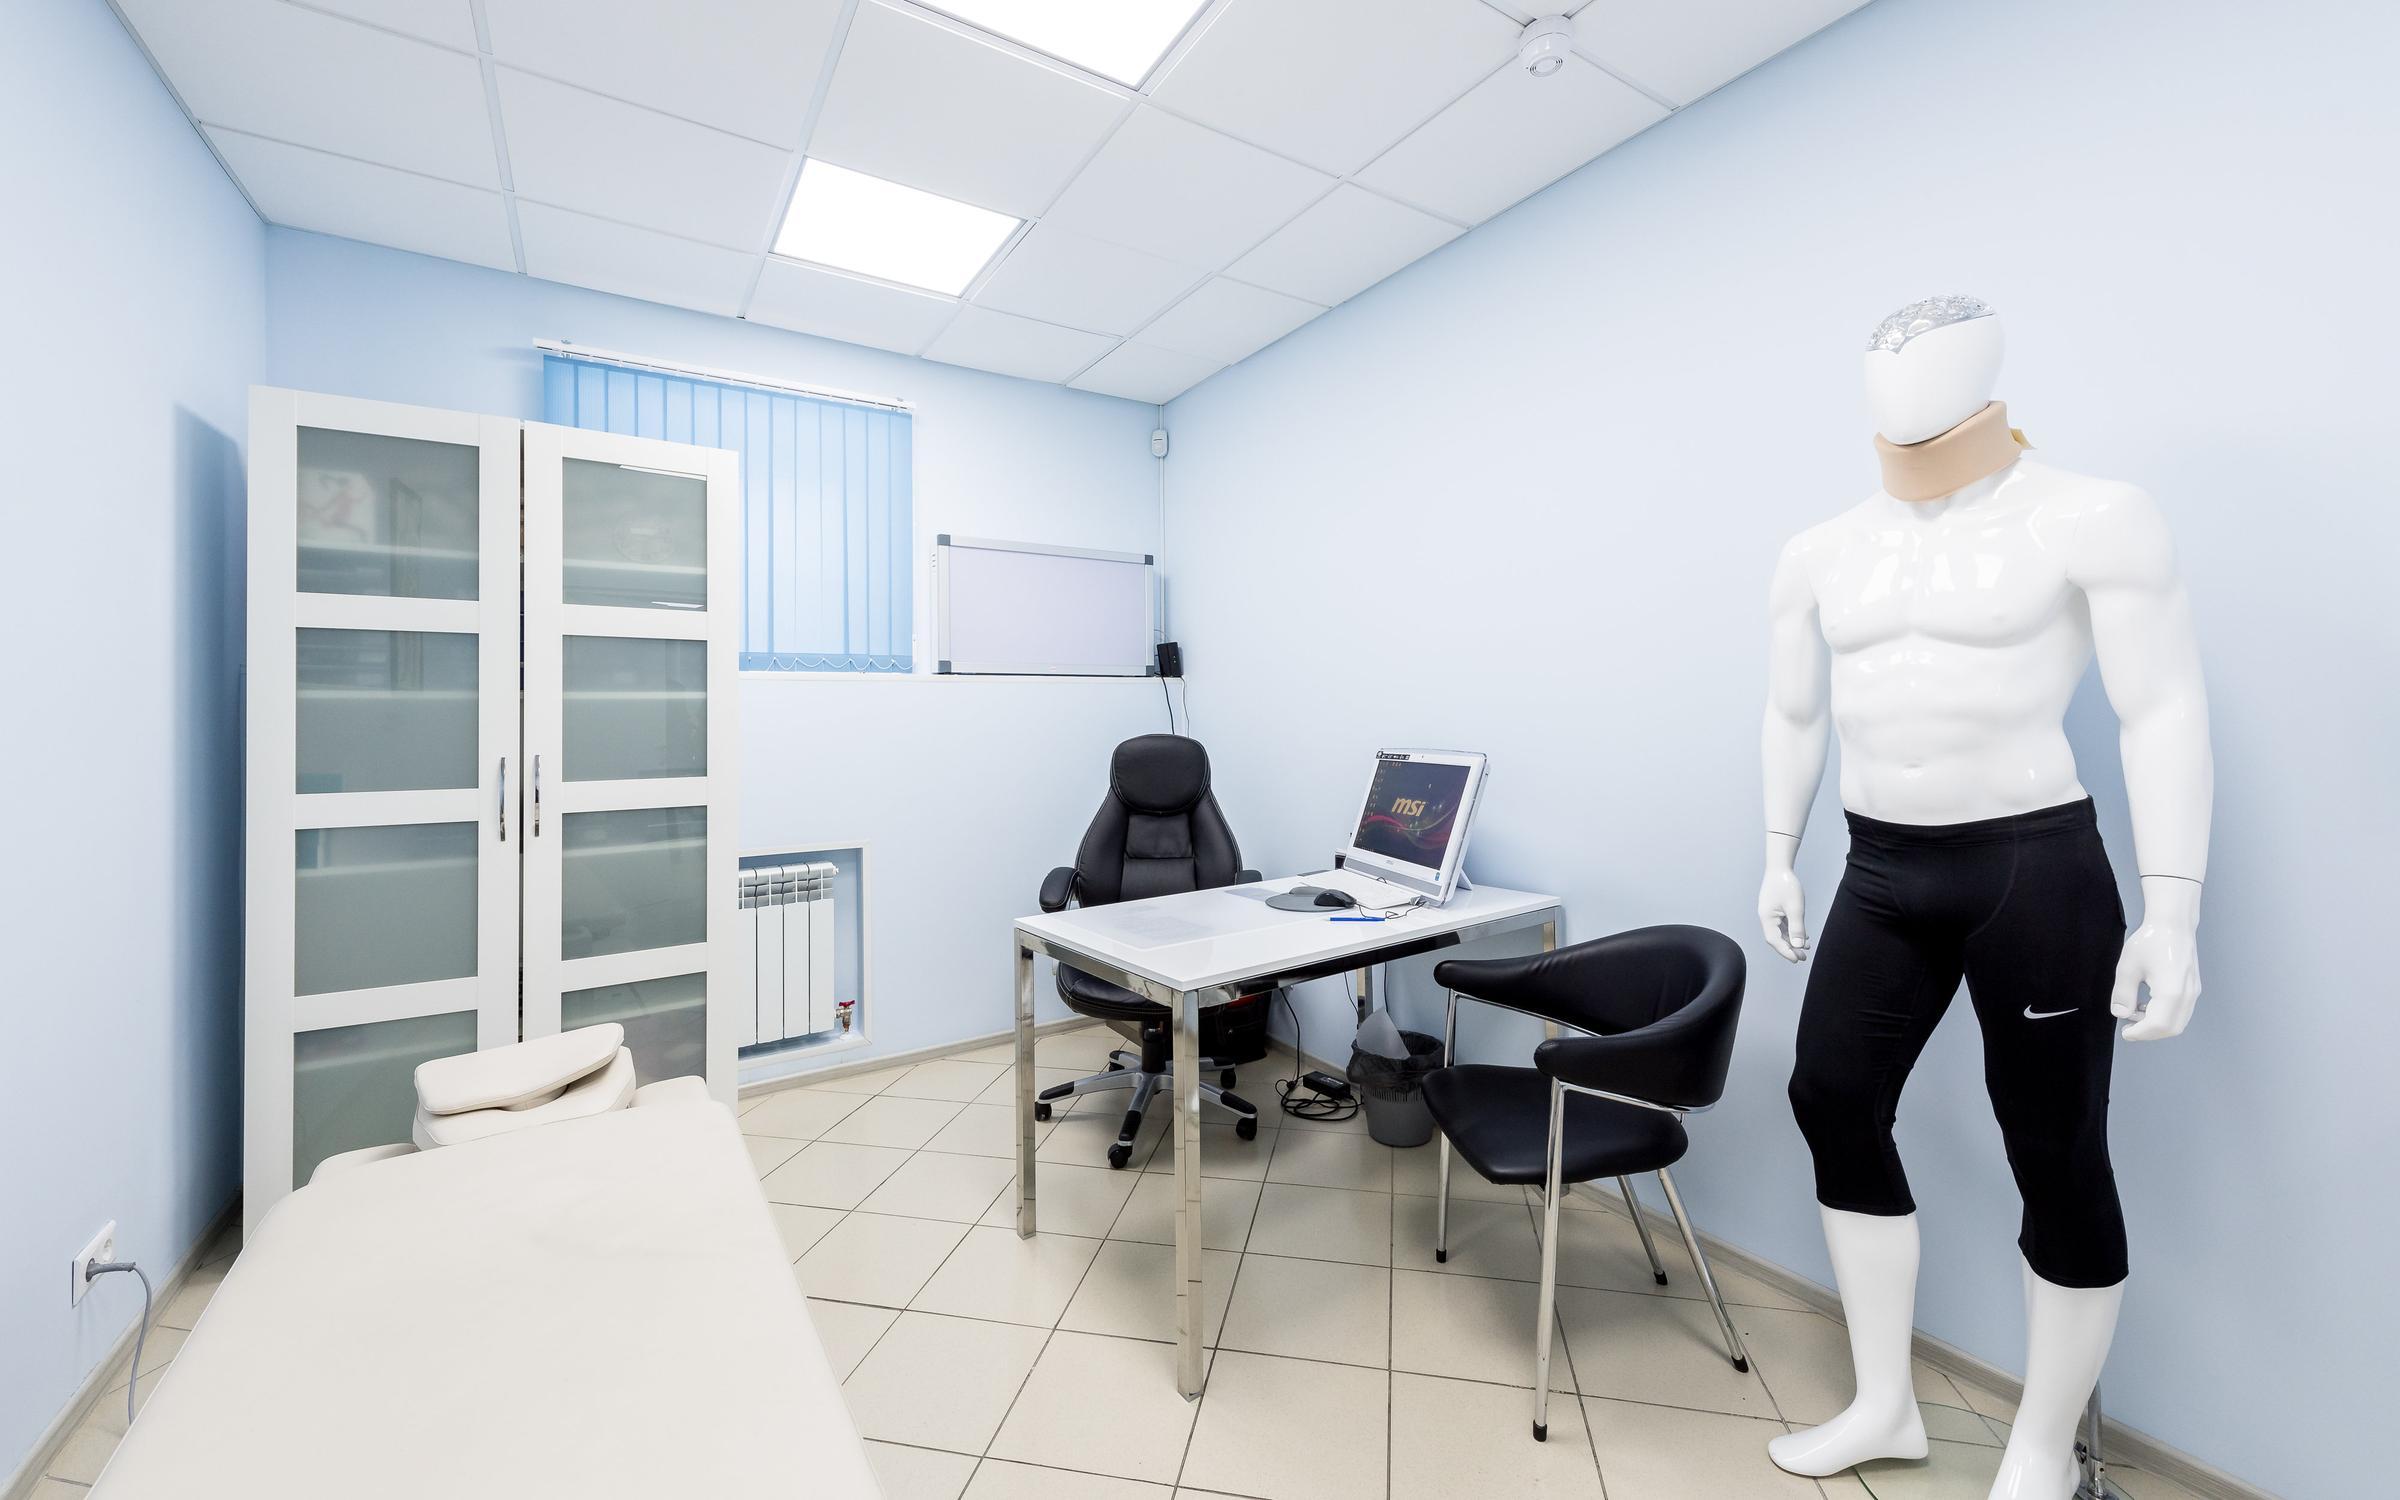 фотография Лечебно-диагностический медицинский центр ЦМРТ на метро Московская